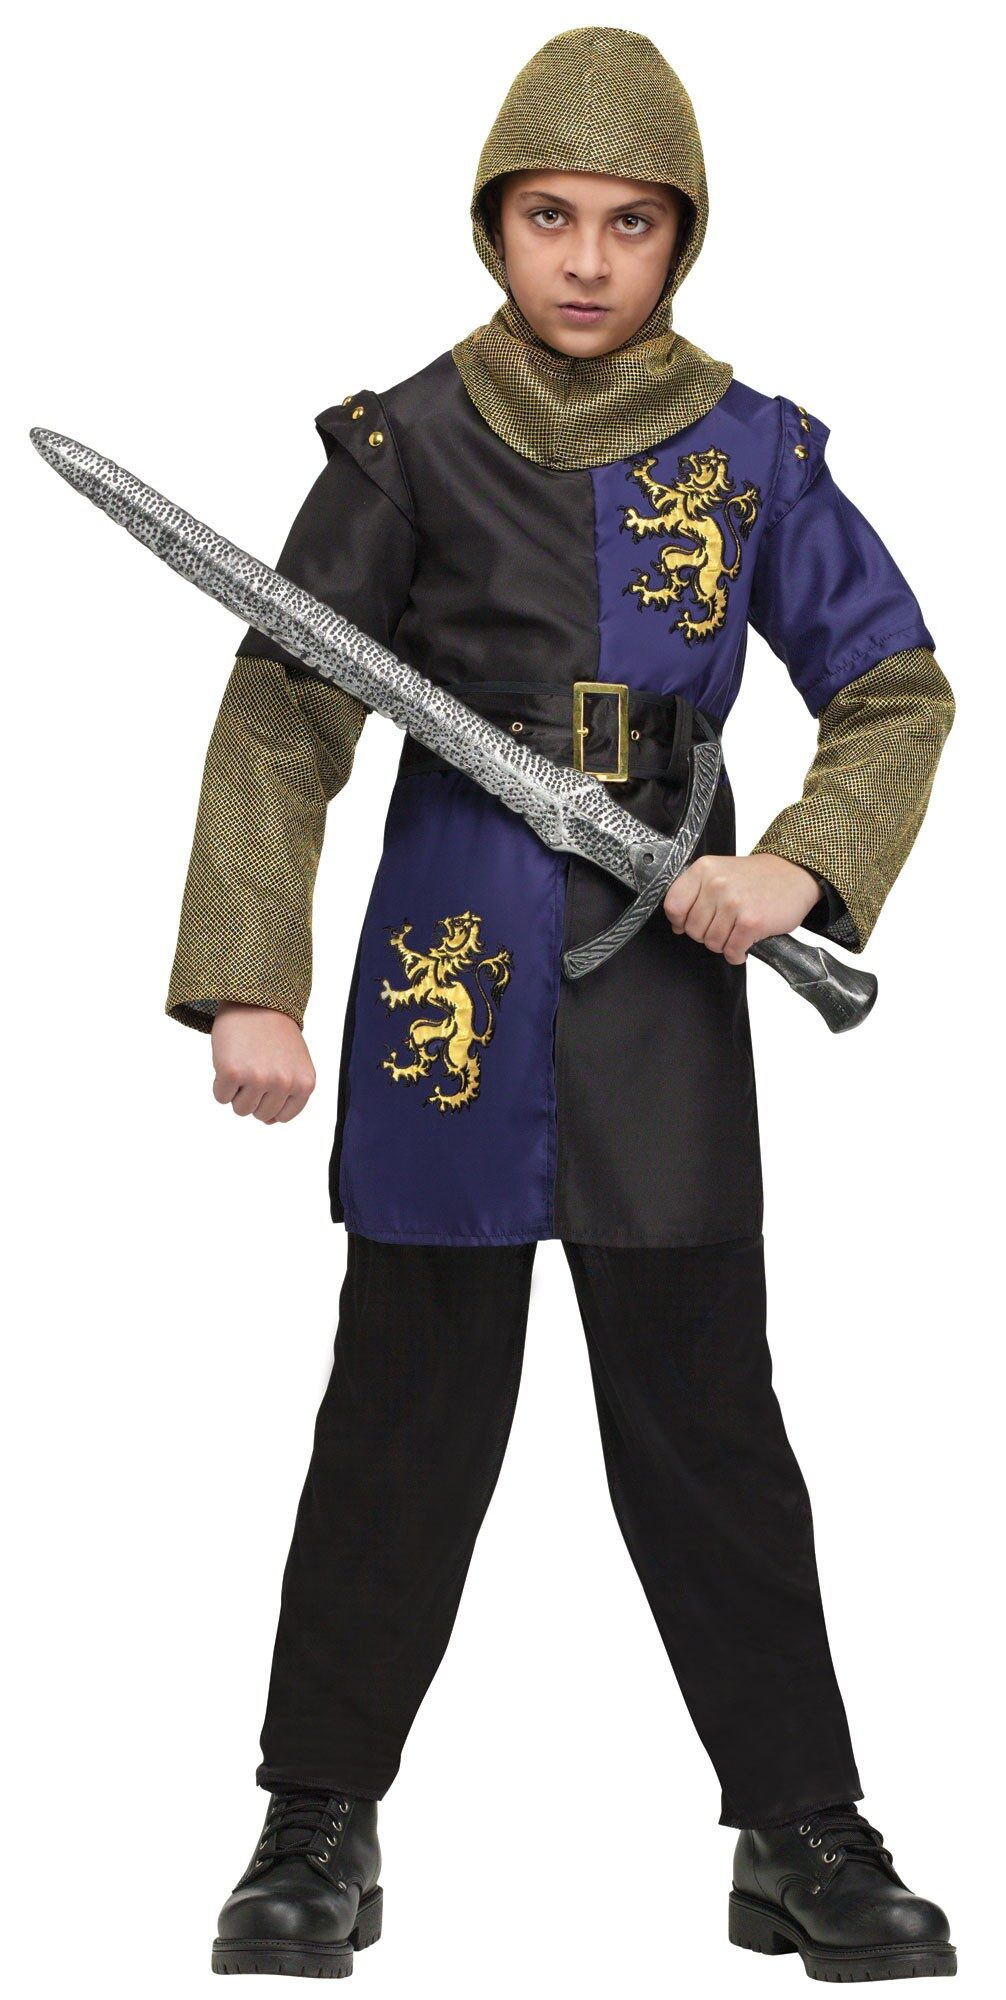 Boys Medieval Renaissance Knight Kids Costume  sc 1 st  Mr. Costumes & Boys Medieval Renaissance Knight Kids Costume - Mr. Costumes